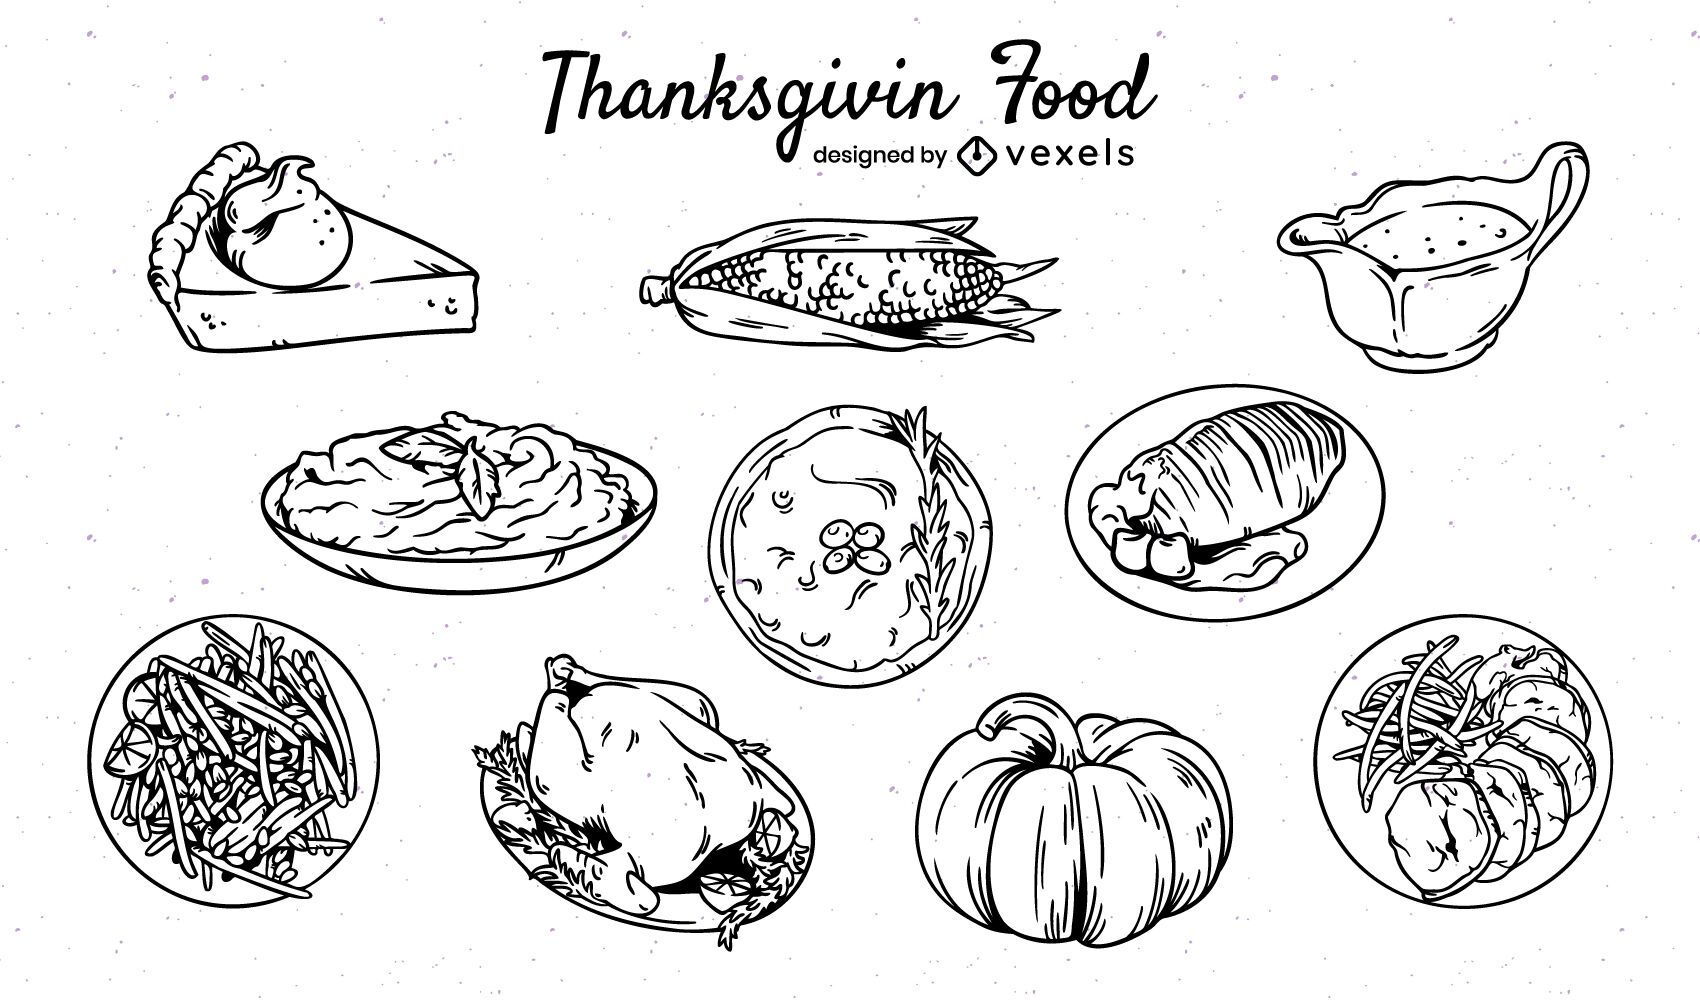 Dibujado a mano comida de acción de gracias